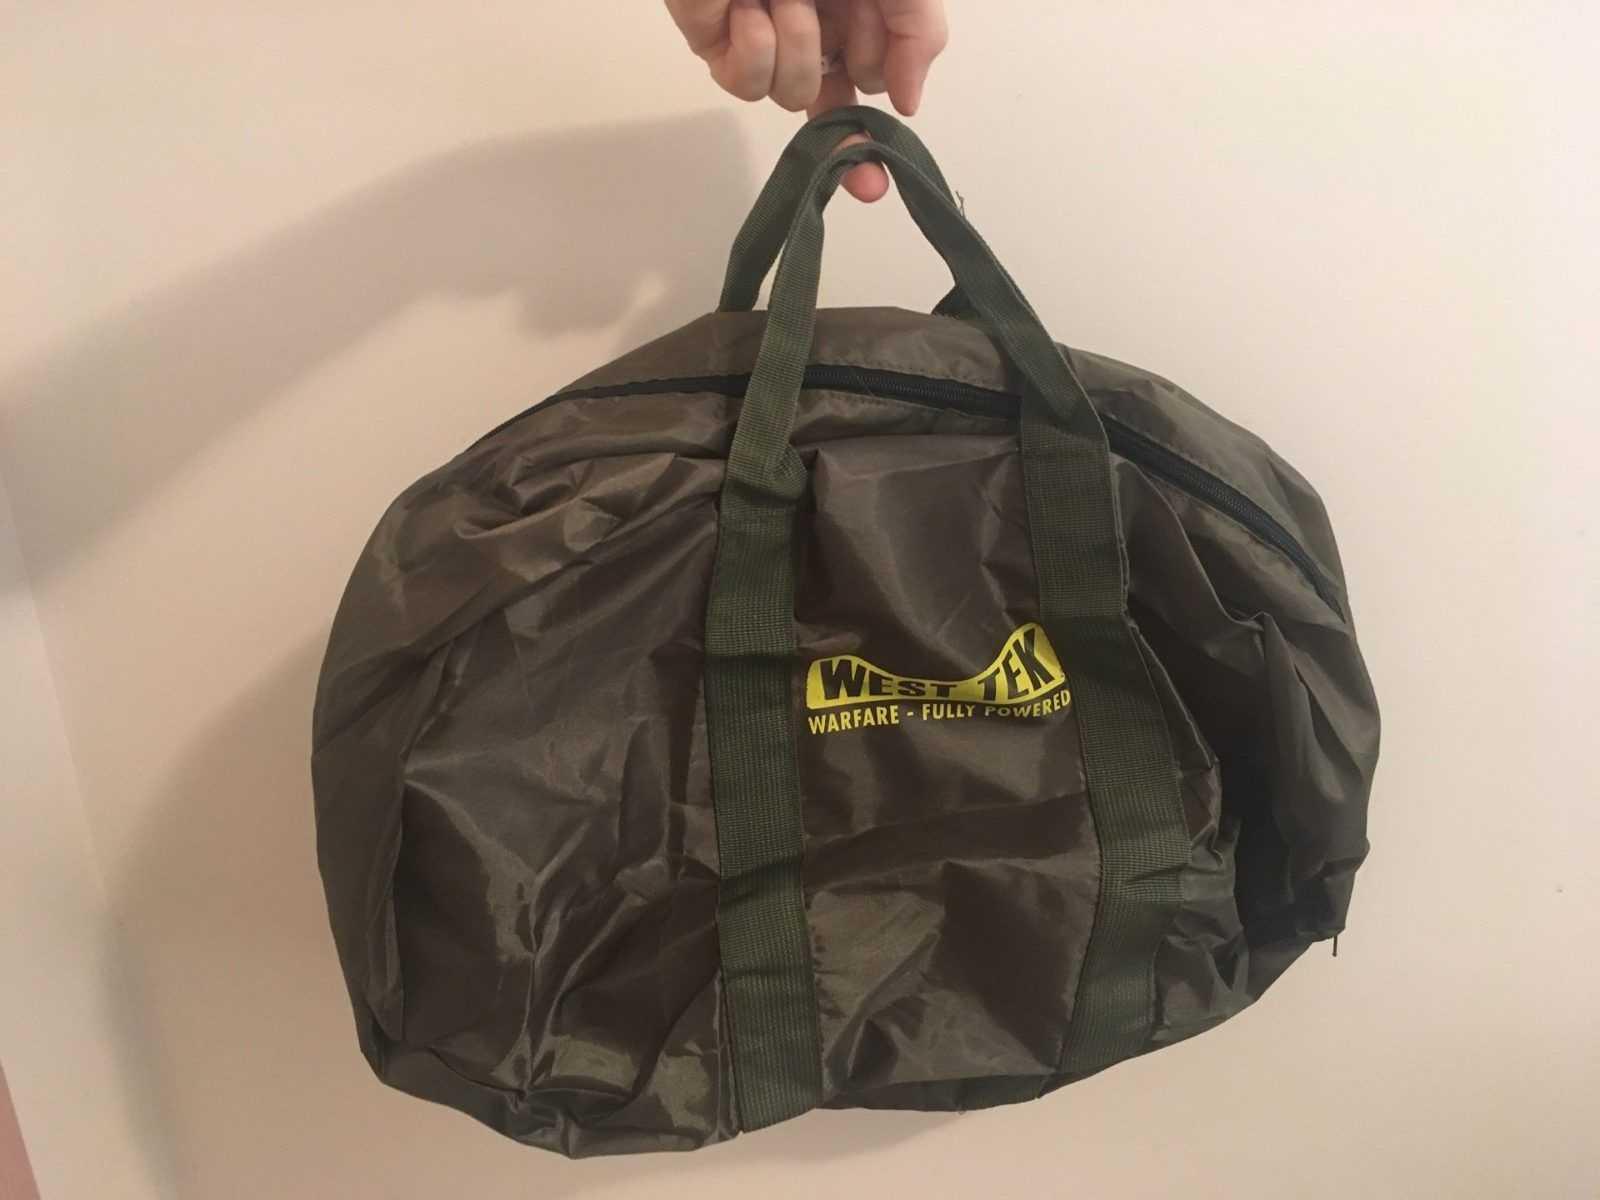 fallout-76-bag.jpg